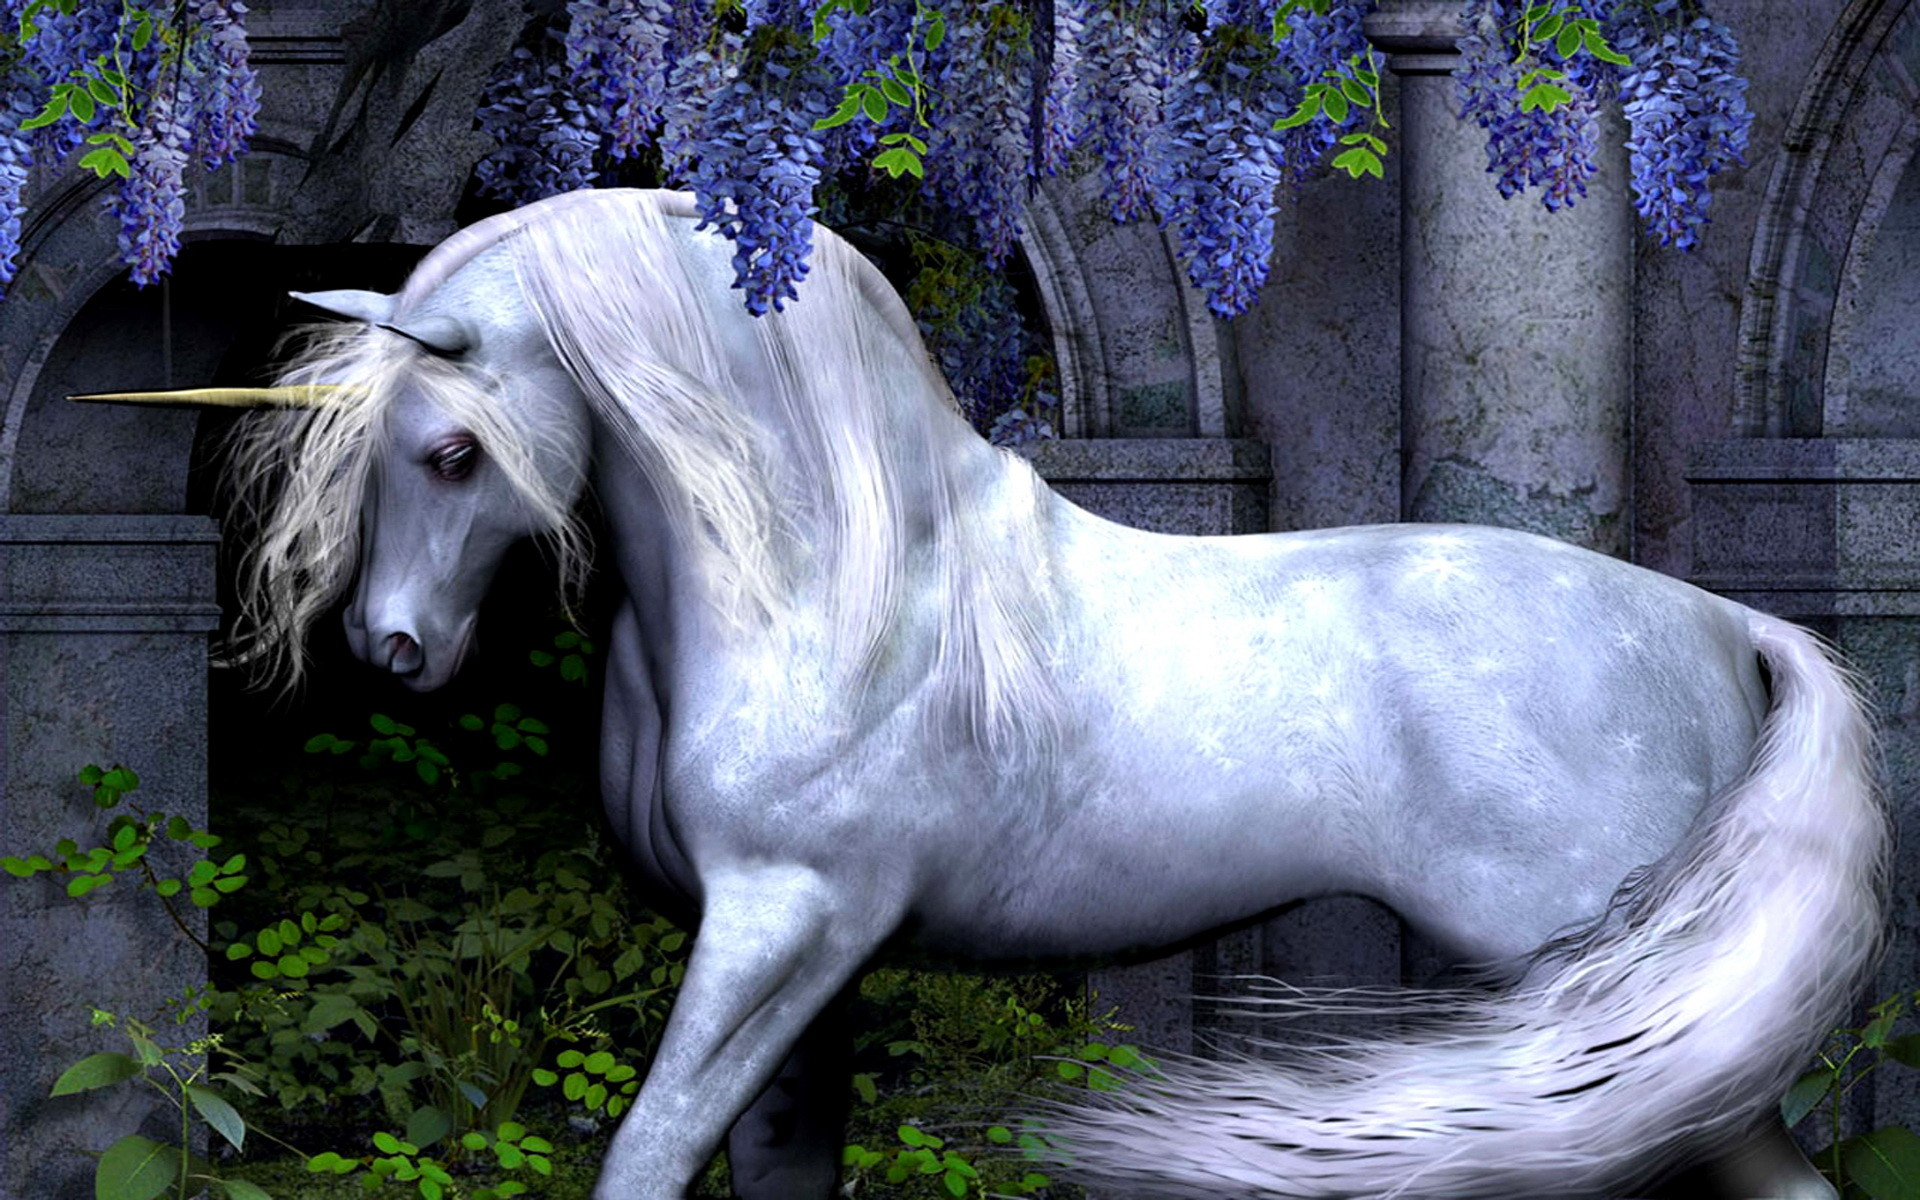 fantasy unicorn wallpapers free desktop downloads unicorn wallpaper .